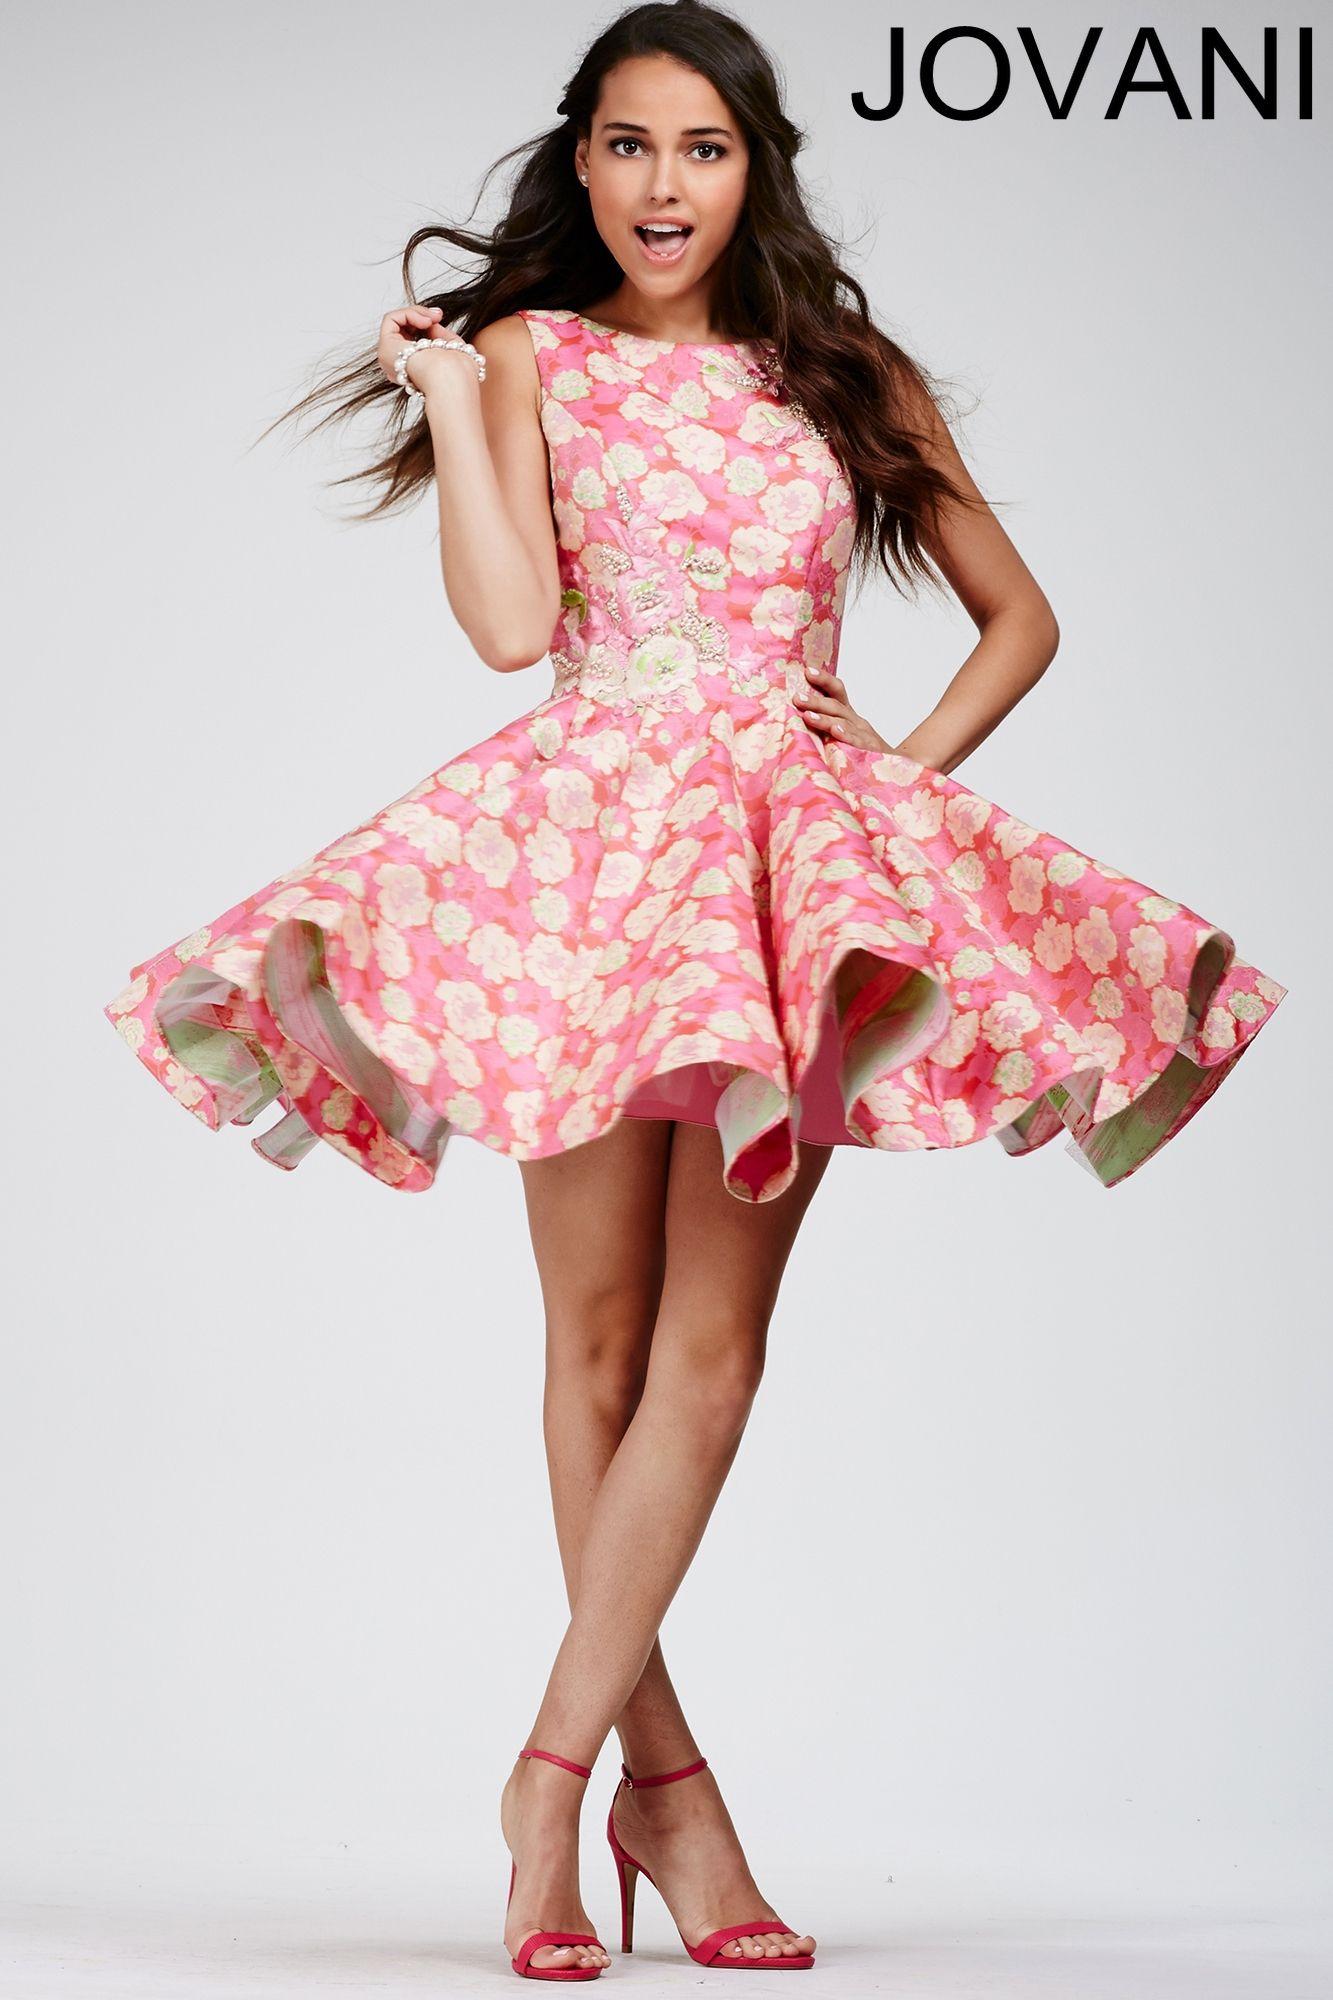 Pin de Jovani Fashion en Homecoming 2015 | Pinterest | Vestiditos